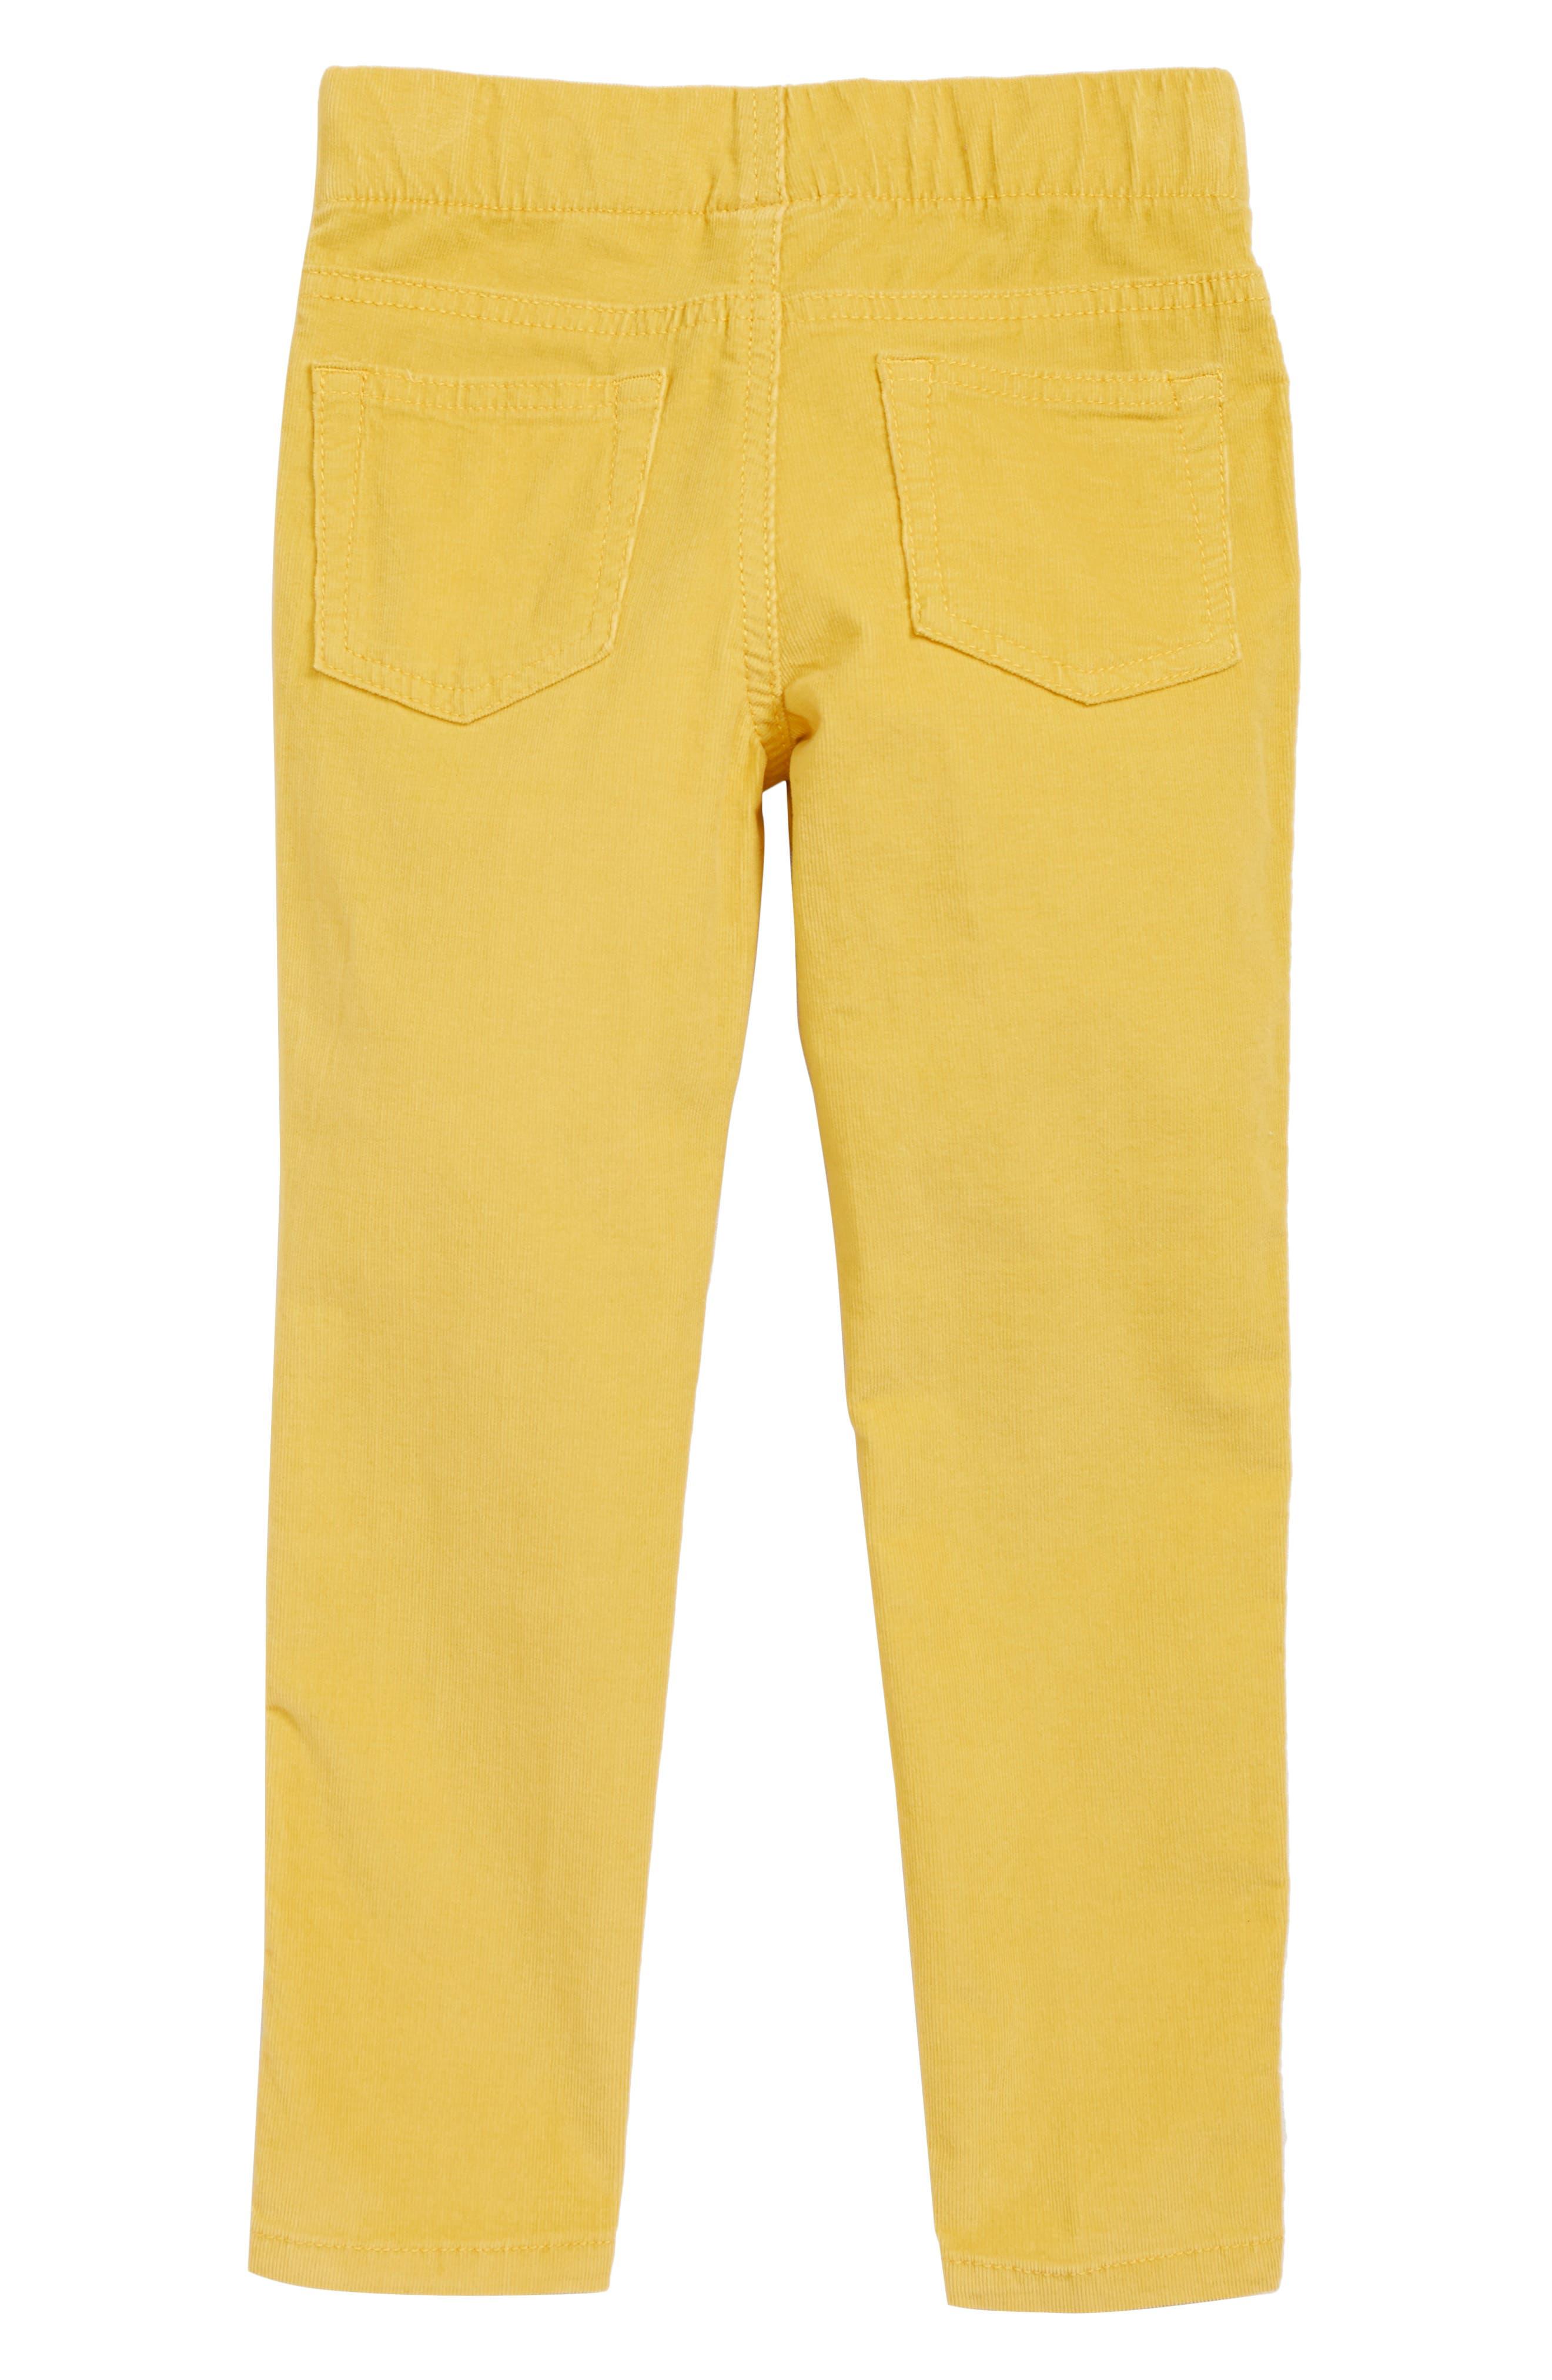 Pull-On Corduroy Pants,                             Alternate thumbnail 2, color,                             YELLOW FUN